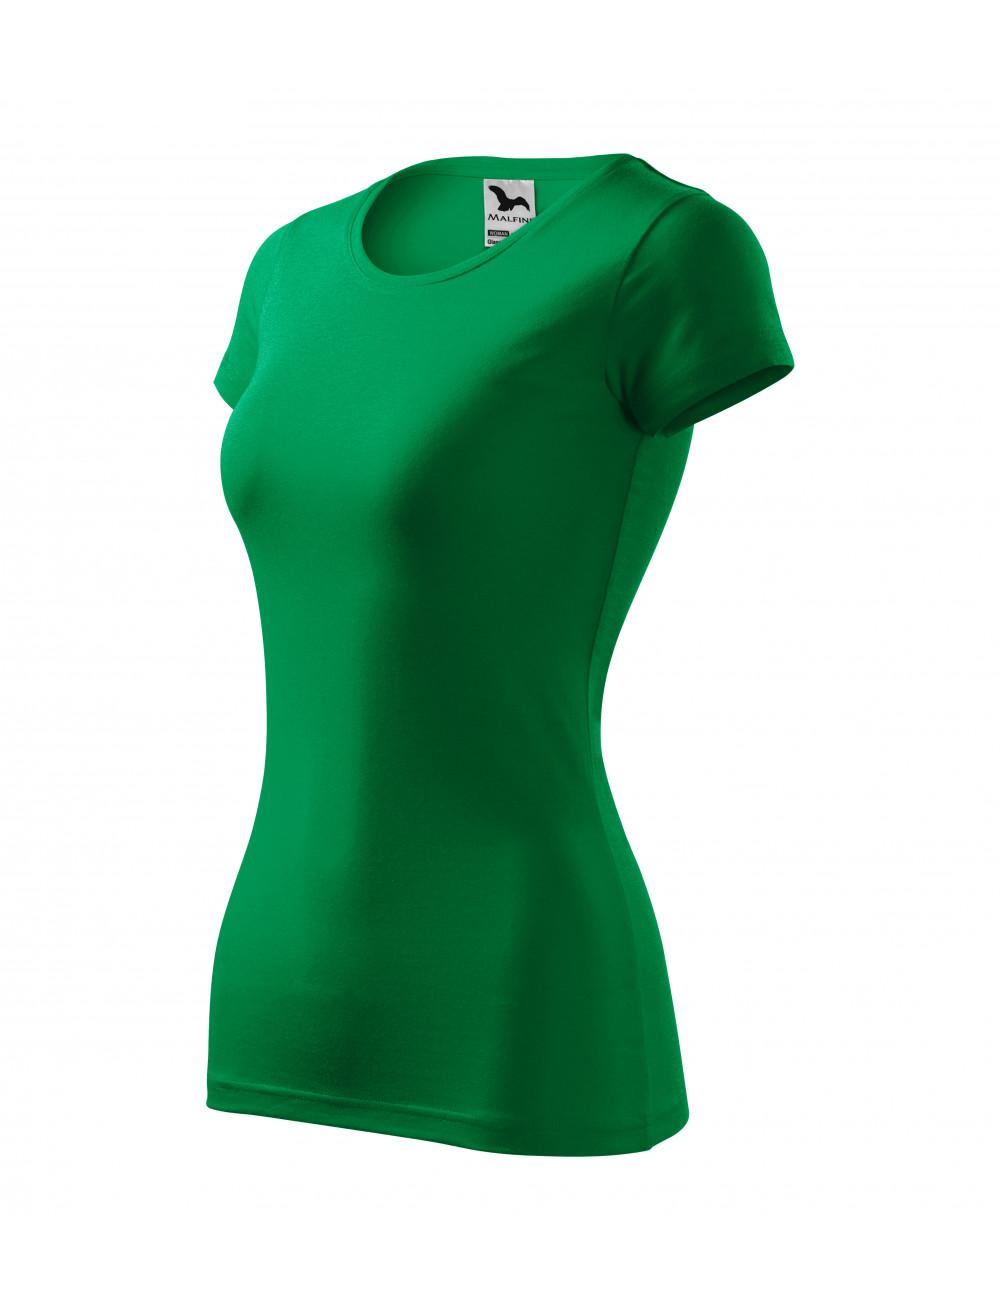 Adler MALFINI Koszulka damska Glance 141 zieleń trawy